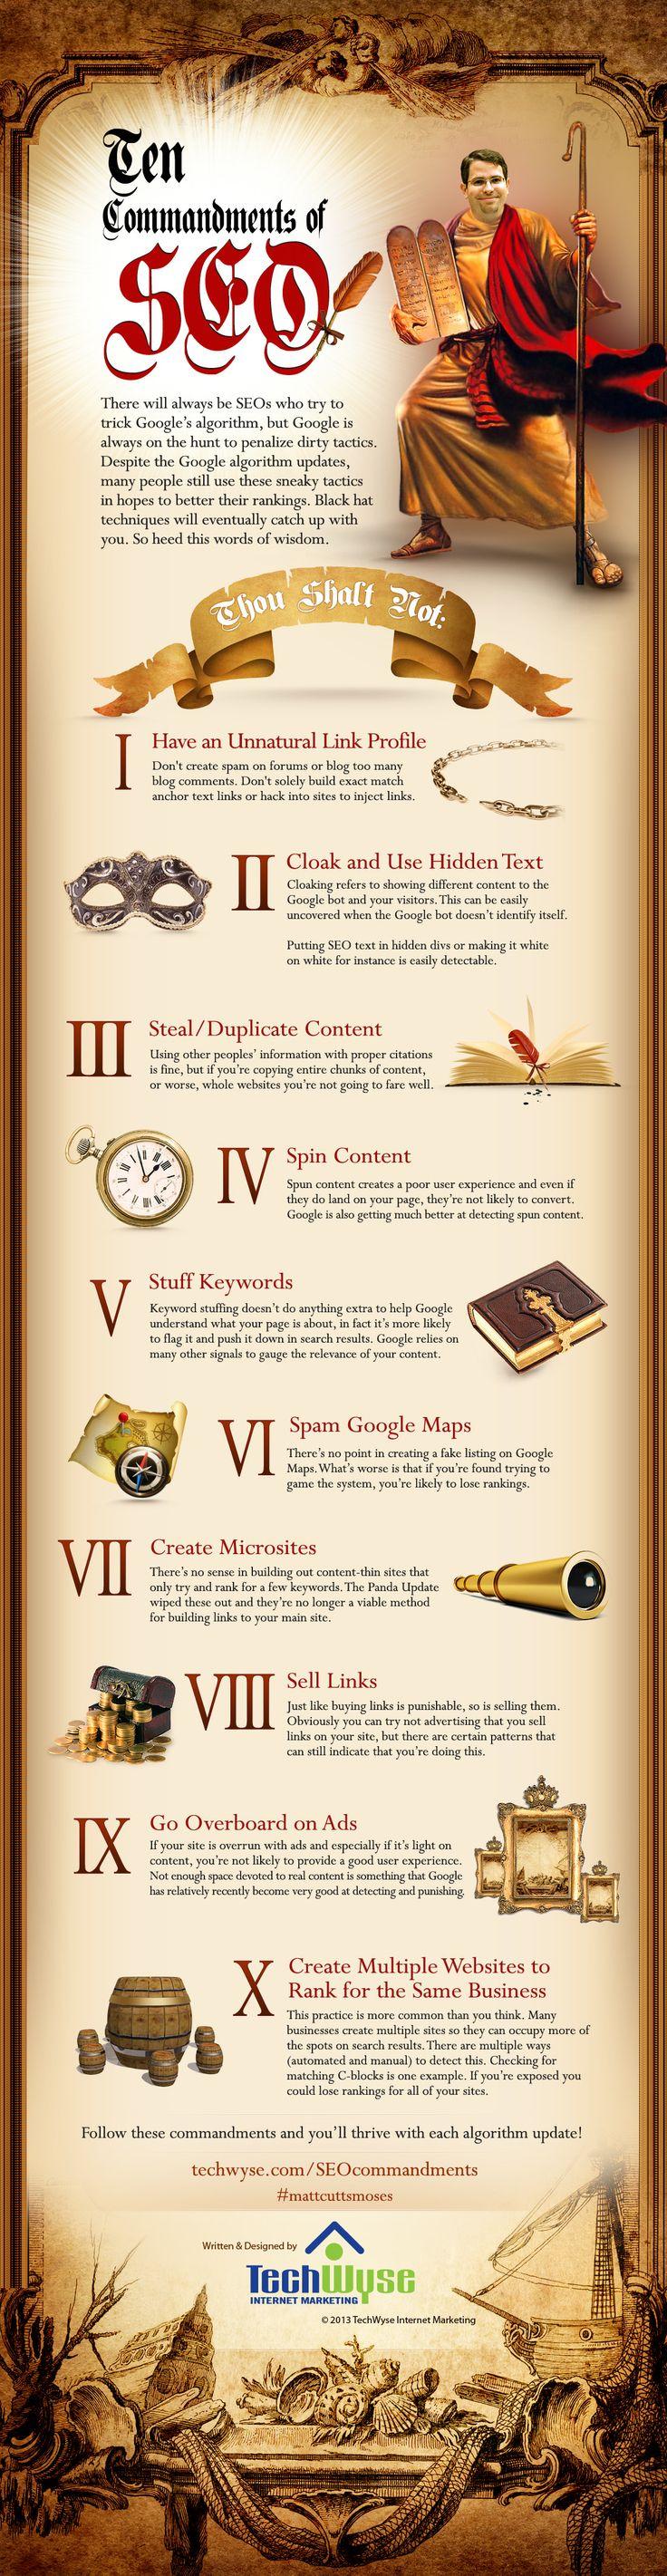 10 Commandments of SEO [Infographic]